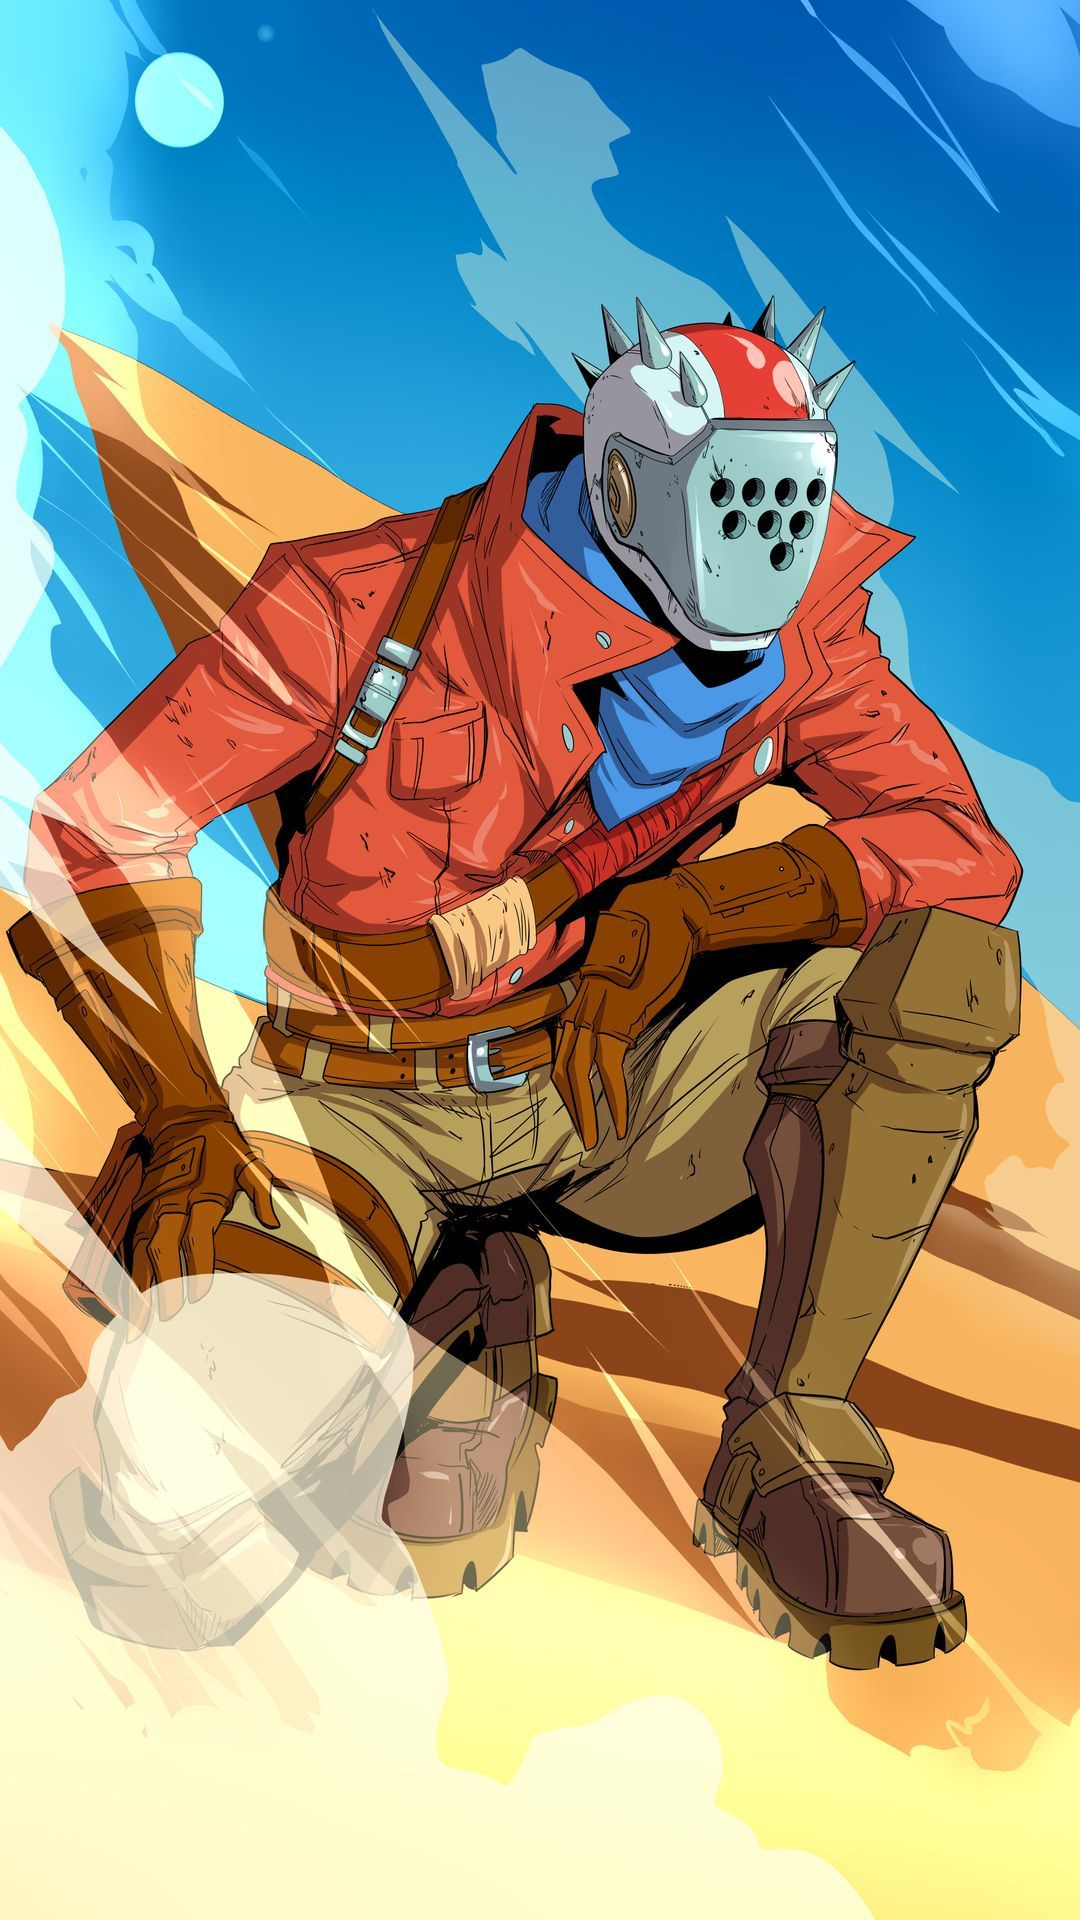 Fortnite Wallpaper Hd Fondo De Pantalla Animado Fondos De Comic